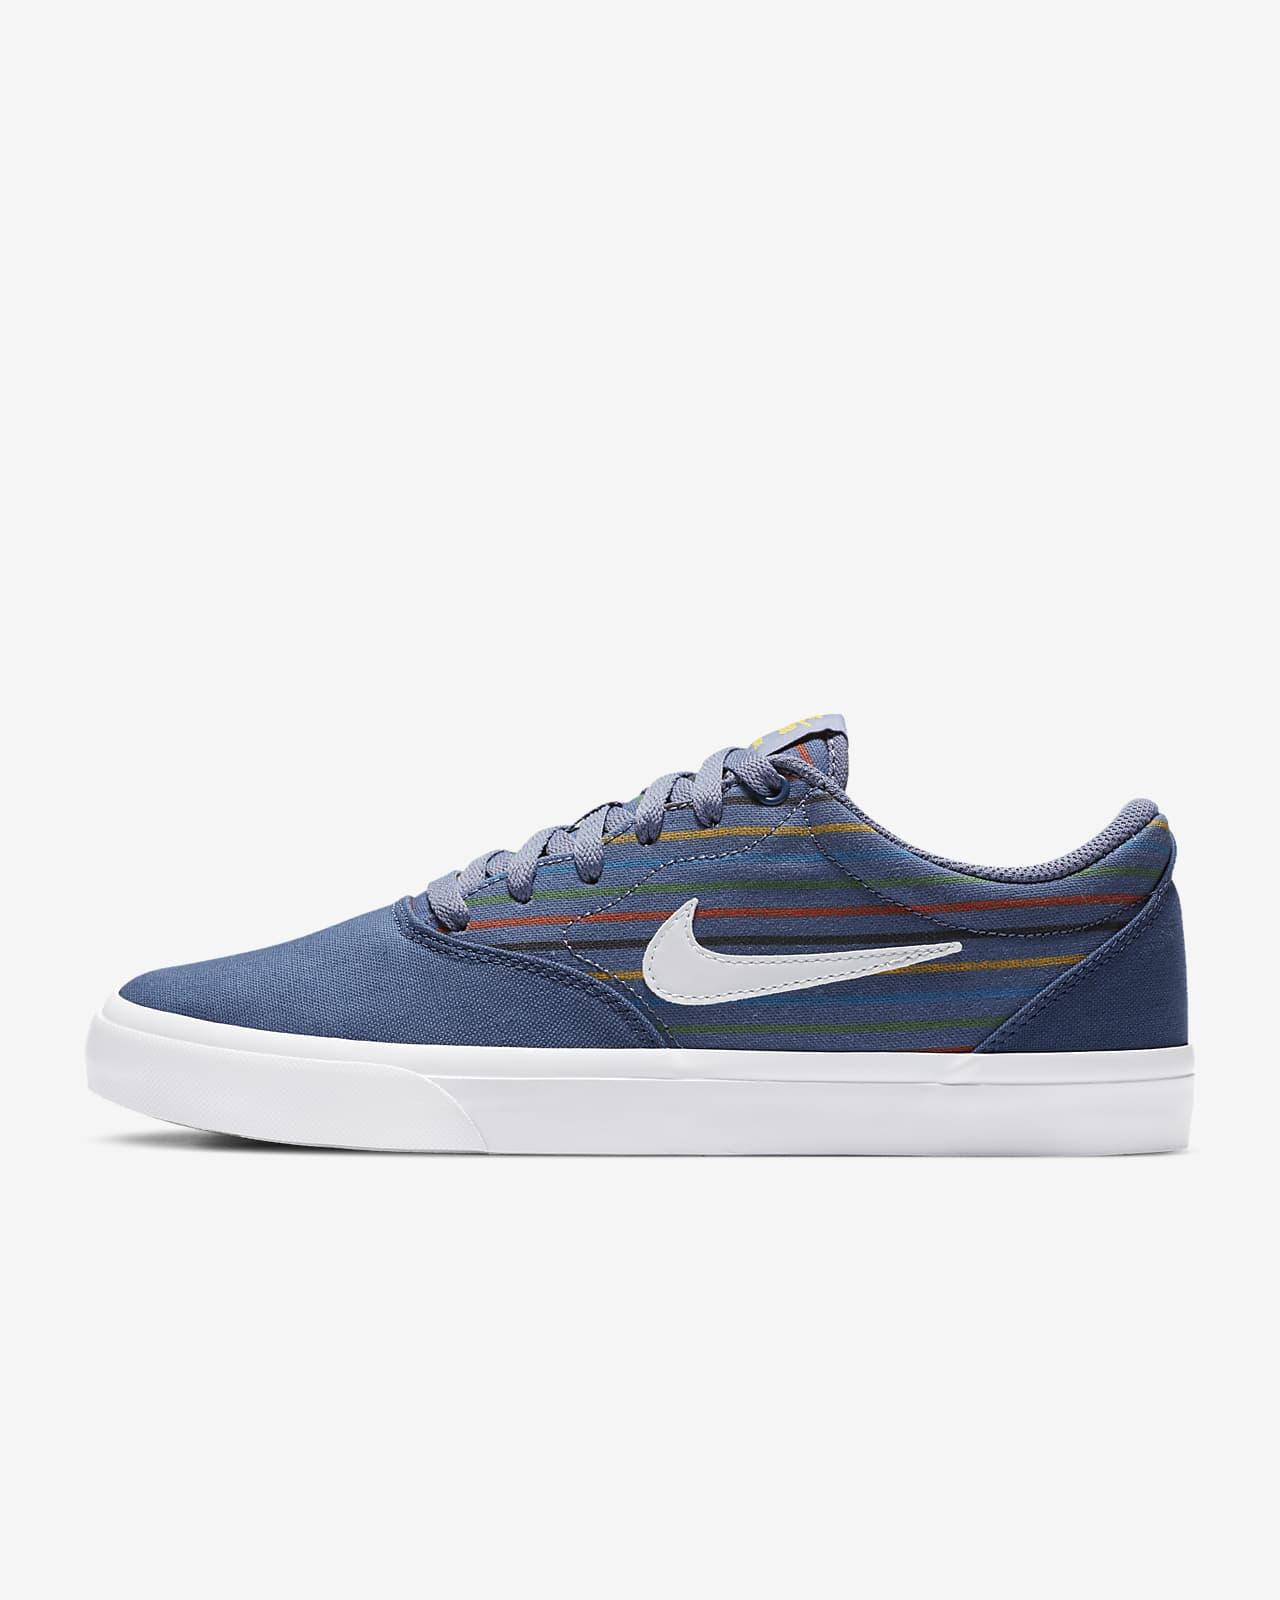 Nike SB Charge Canvas Premium Skate